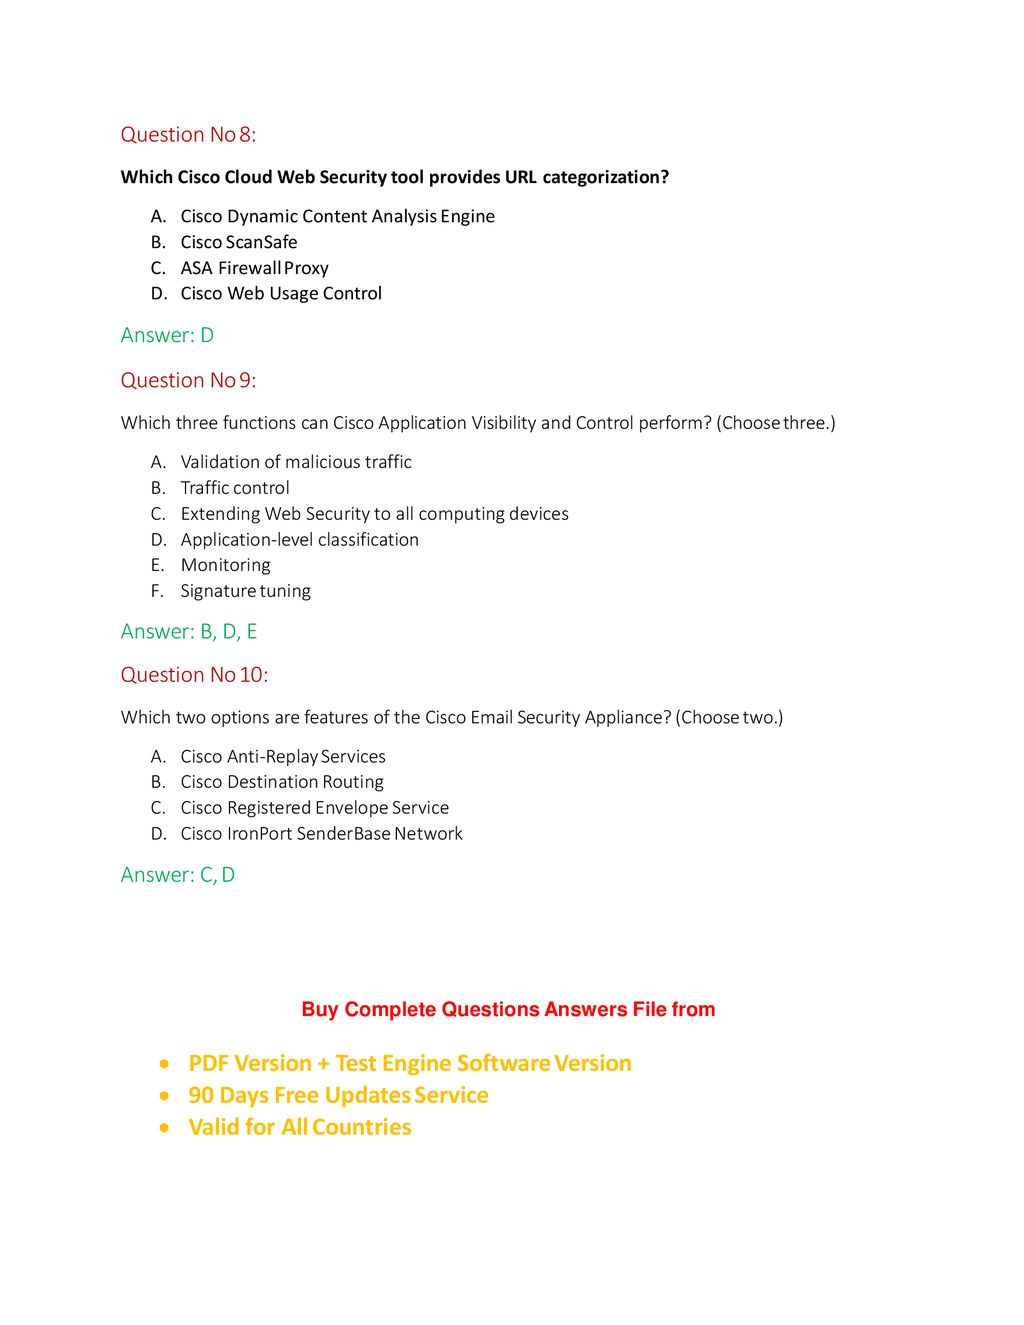 test pdf file to download